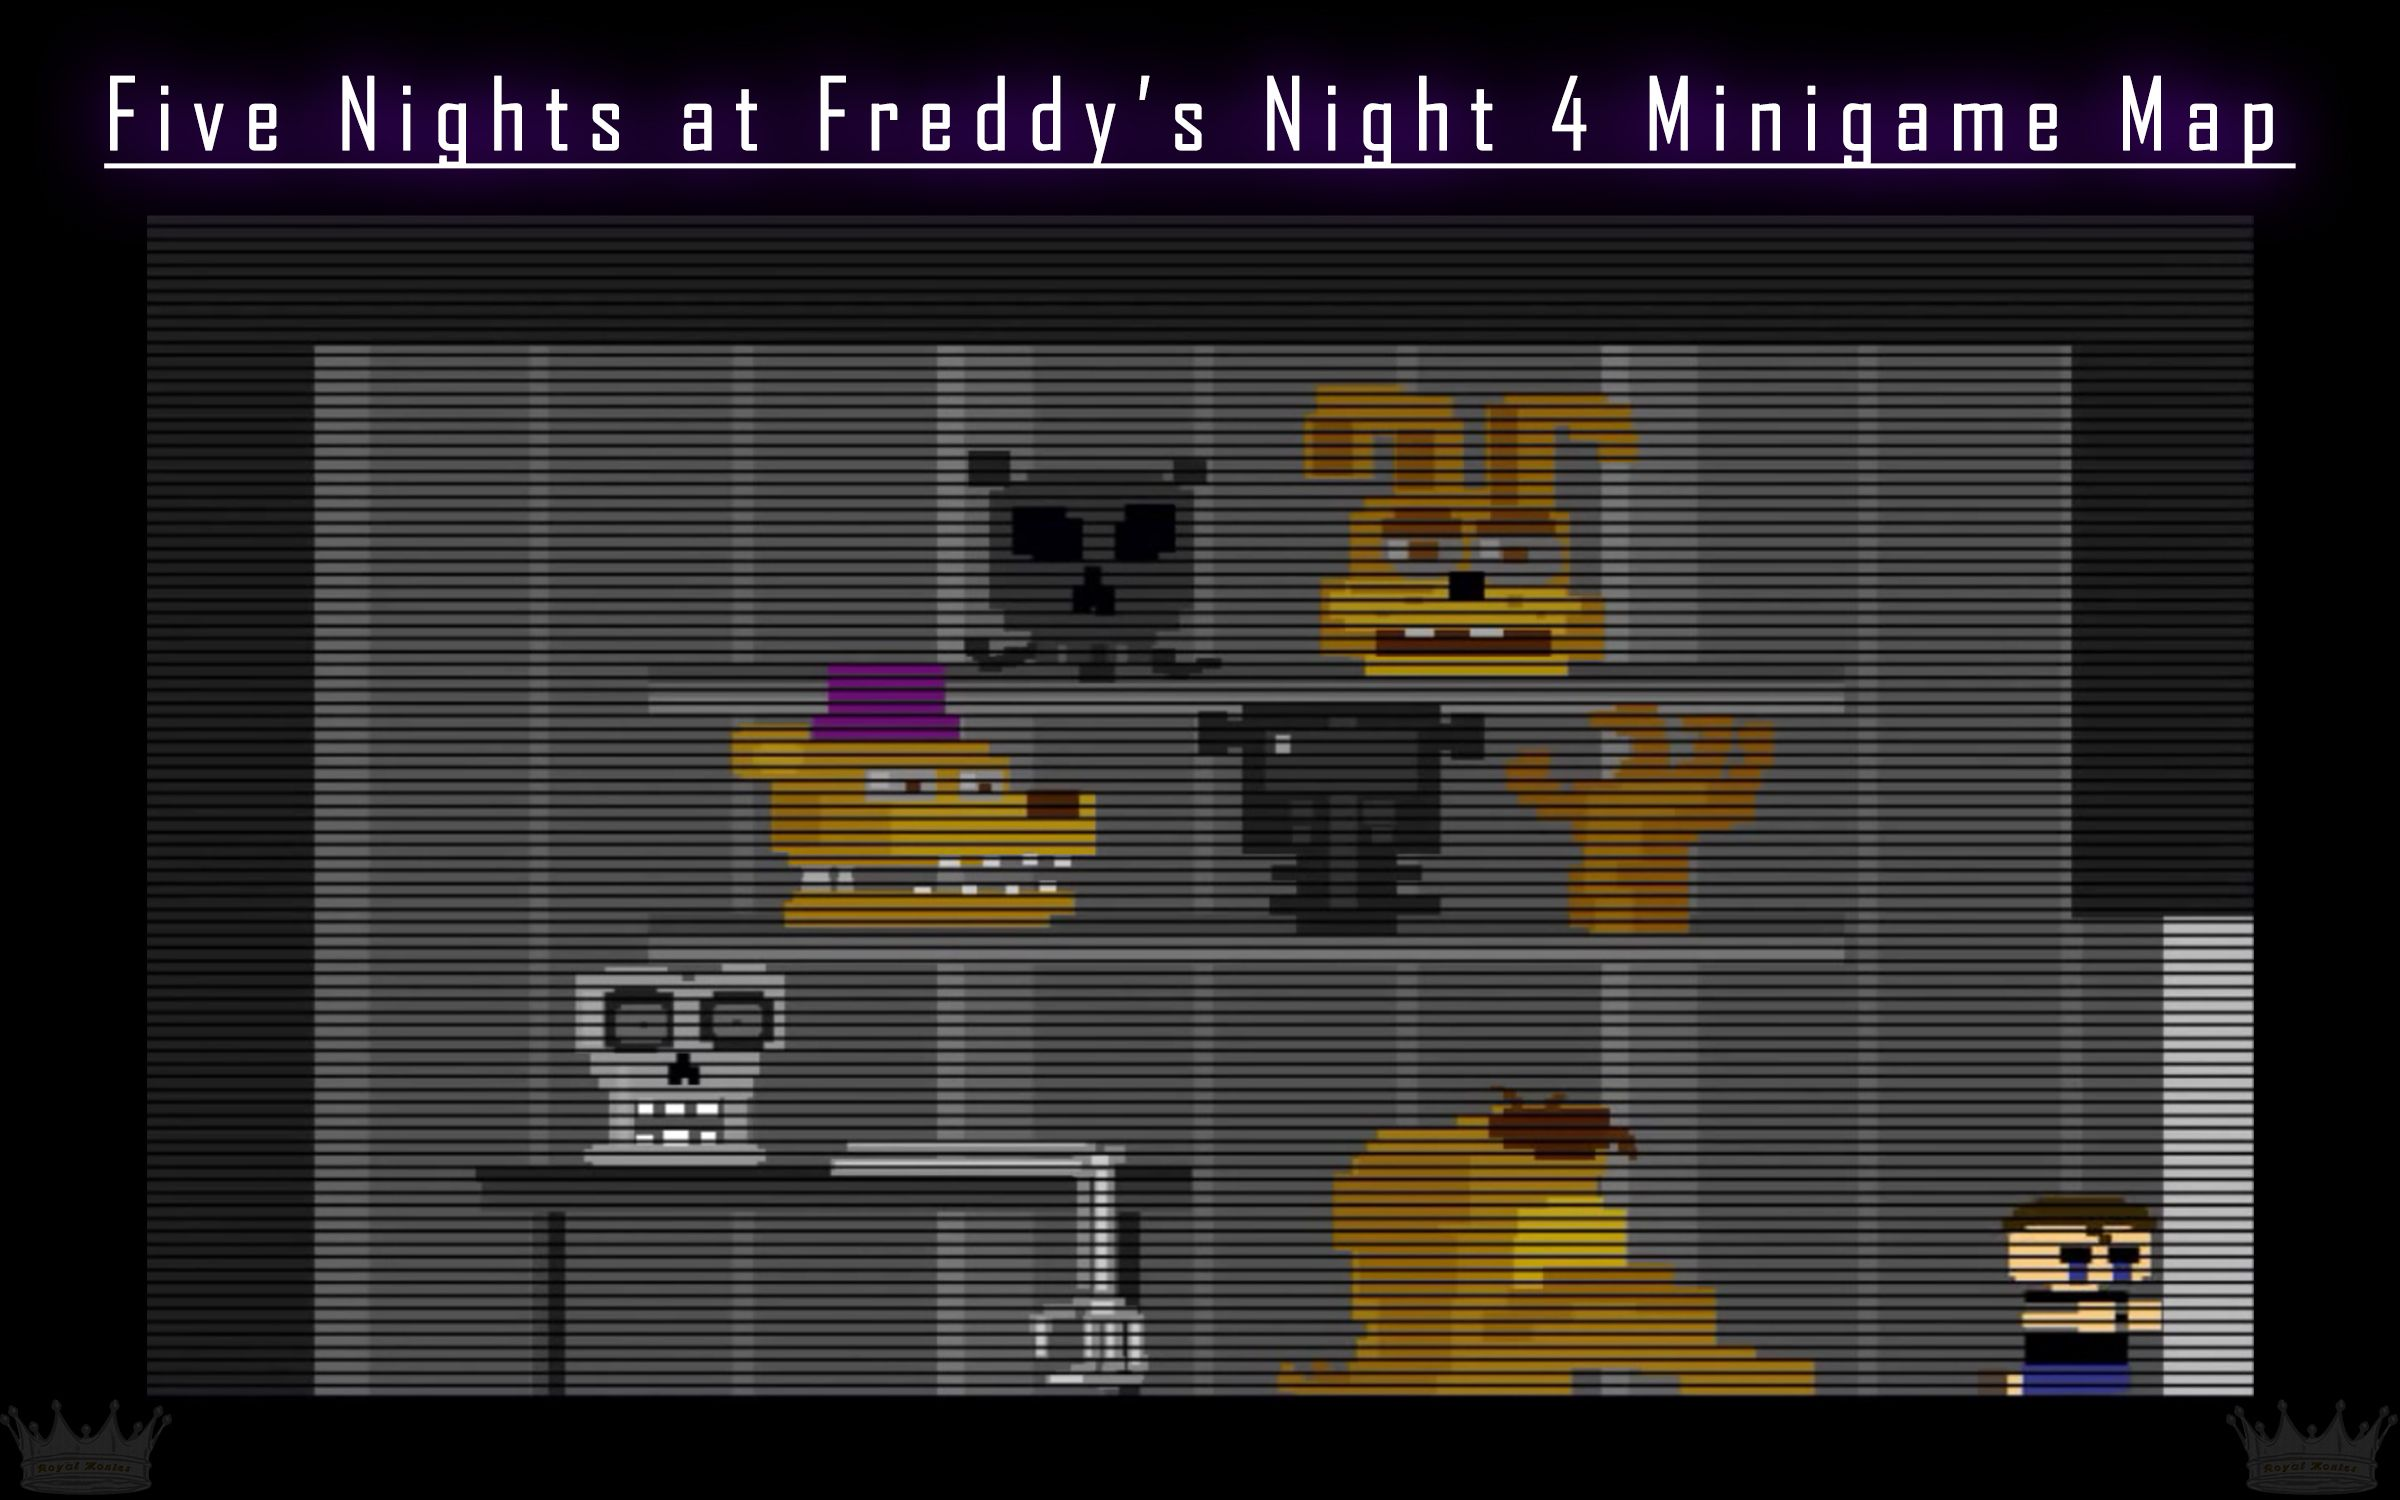 Five Nights at Freddy's 4 Night 4 Map #RedditGaming #fnaf #4 #FiveNightsatFreddys4 #Scottgames #steam